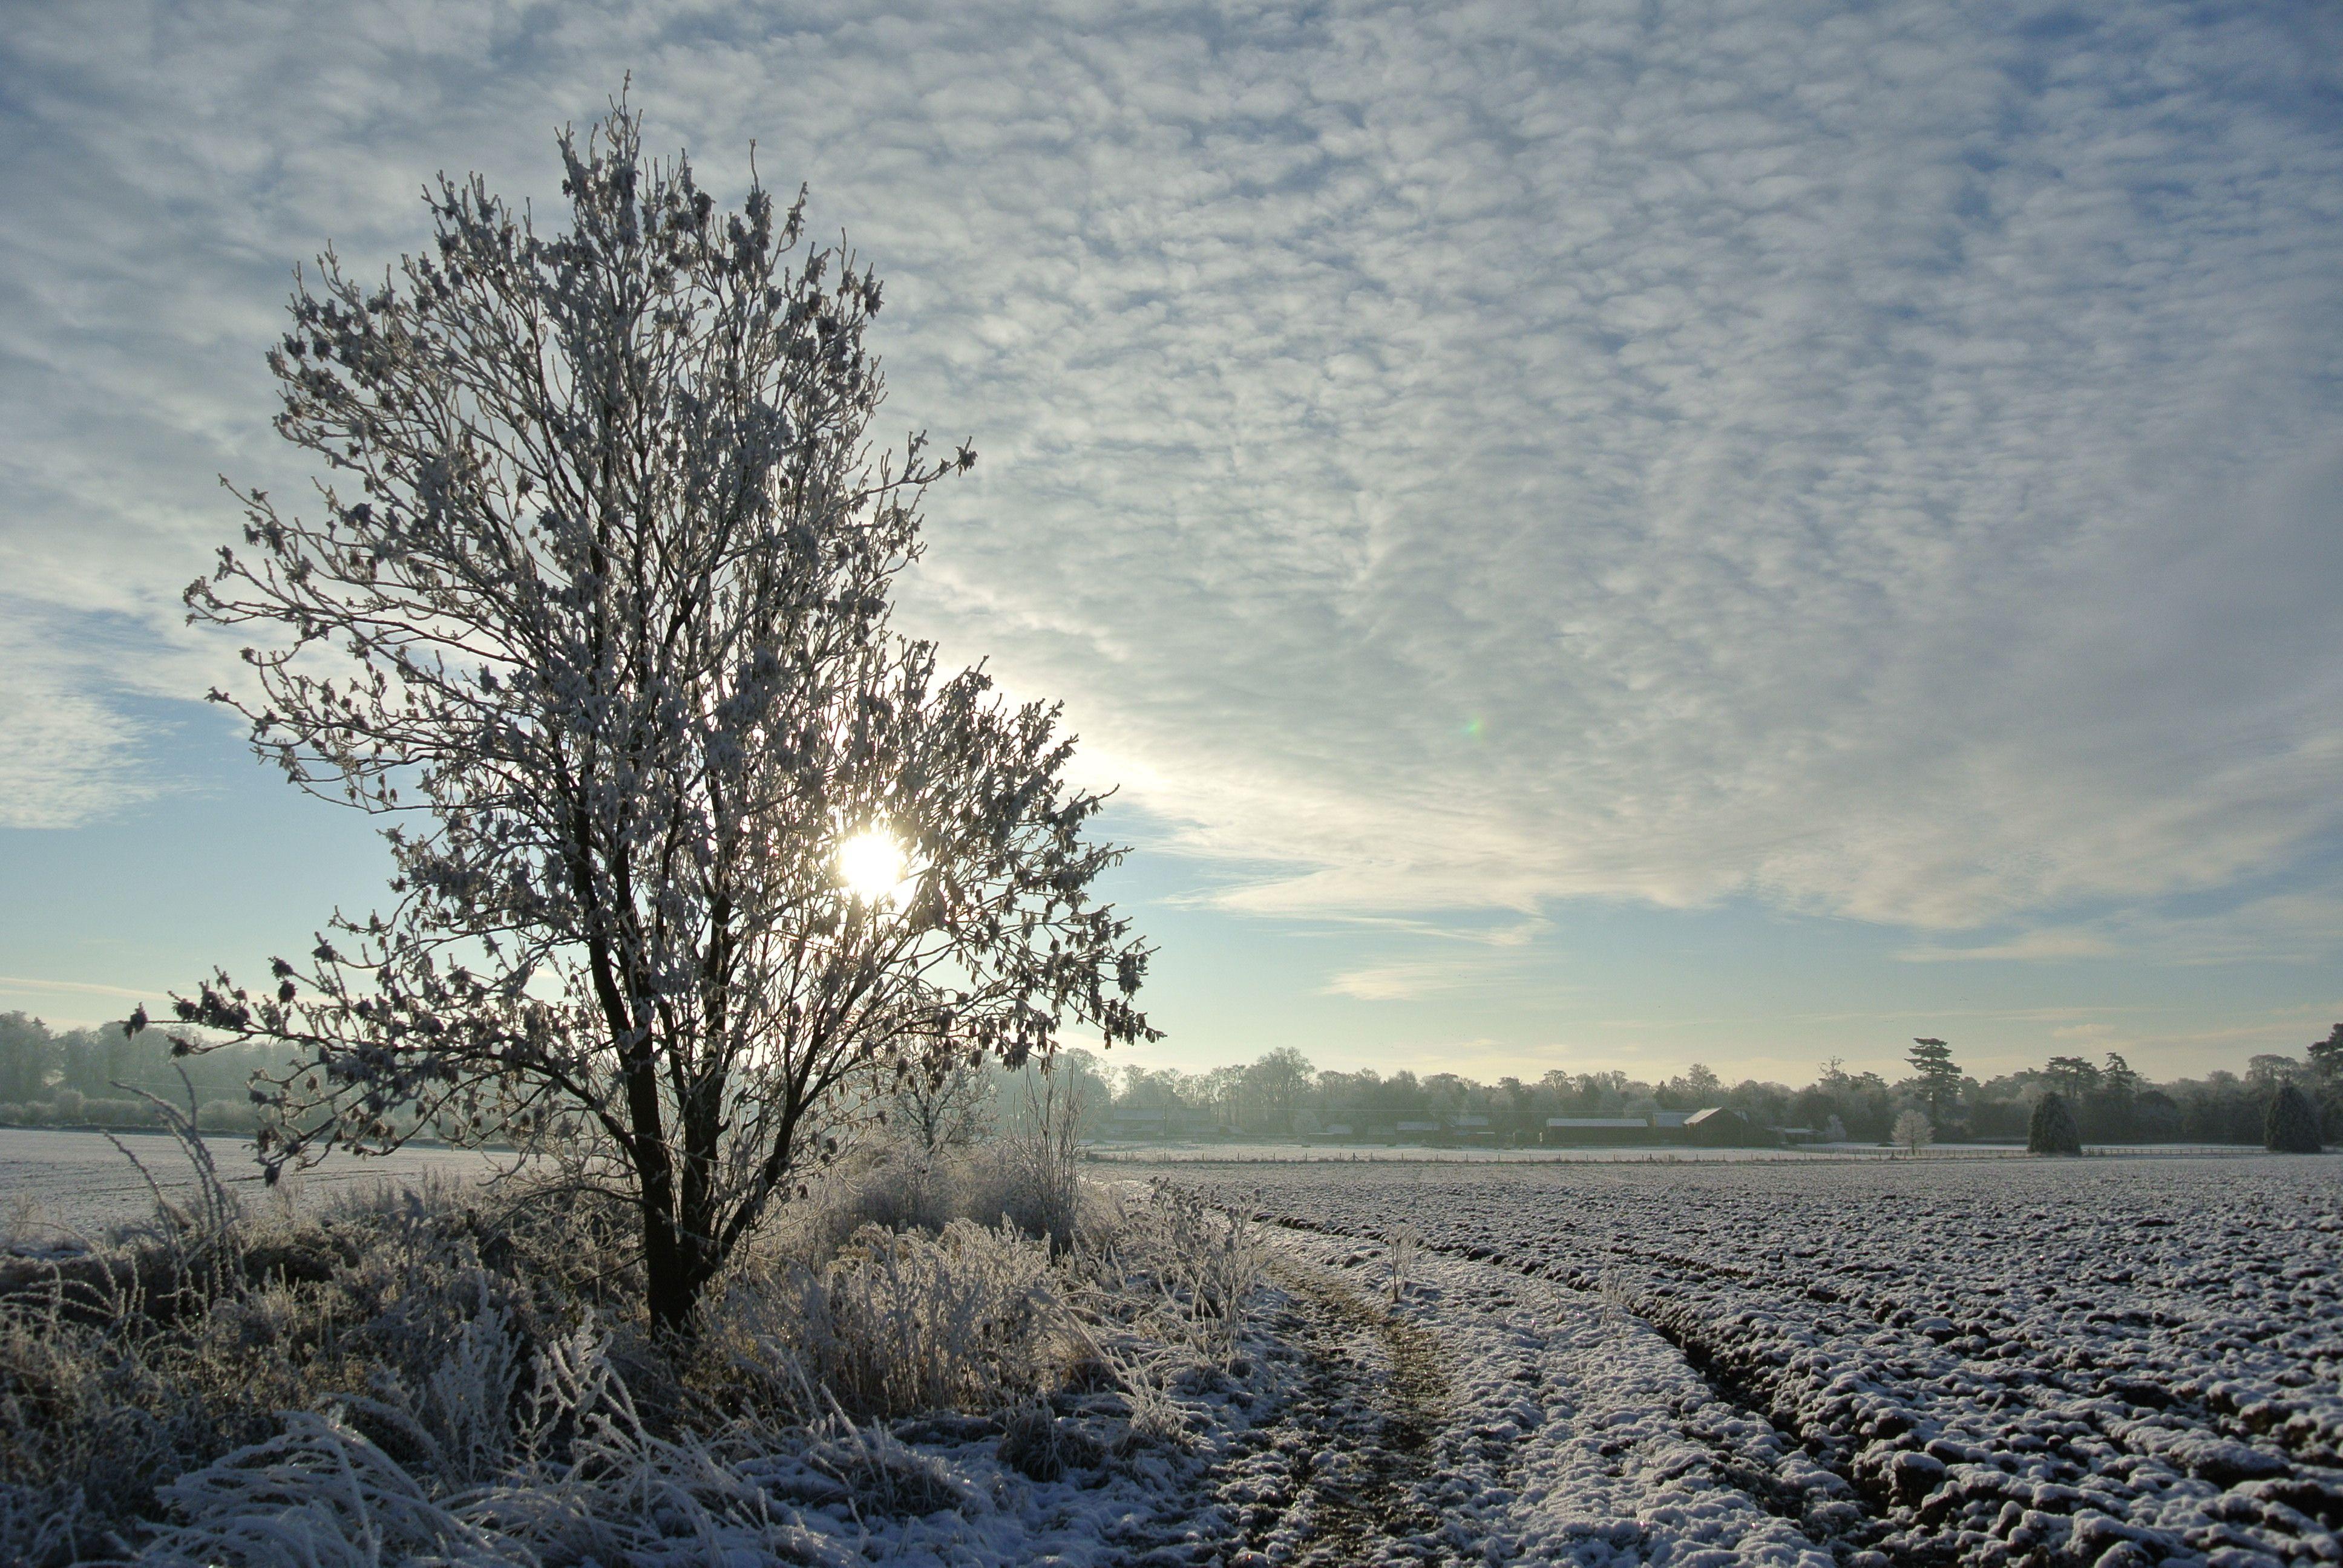 One Snowy Day Bea Broadwood